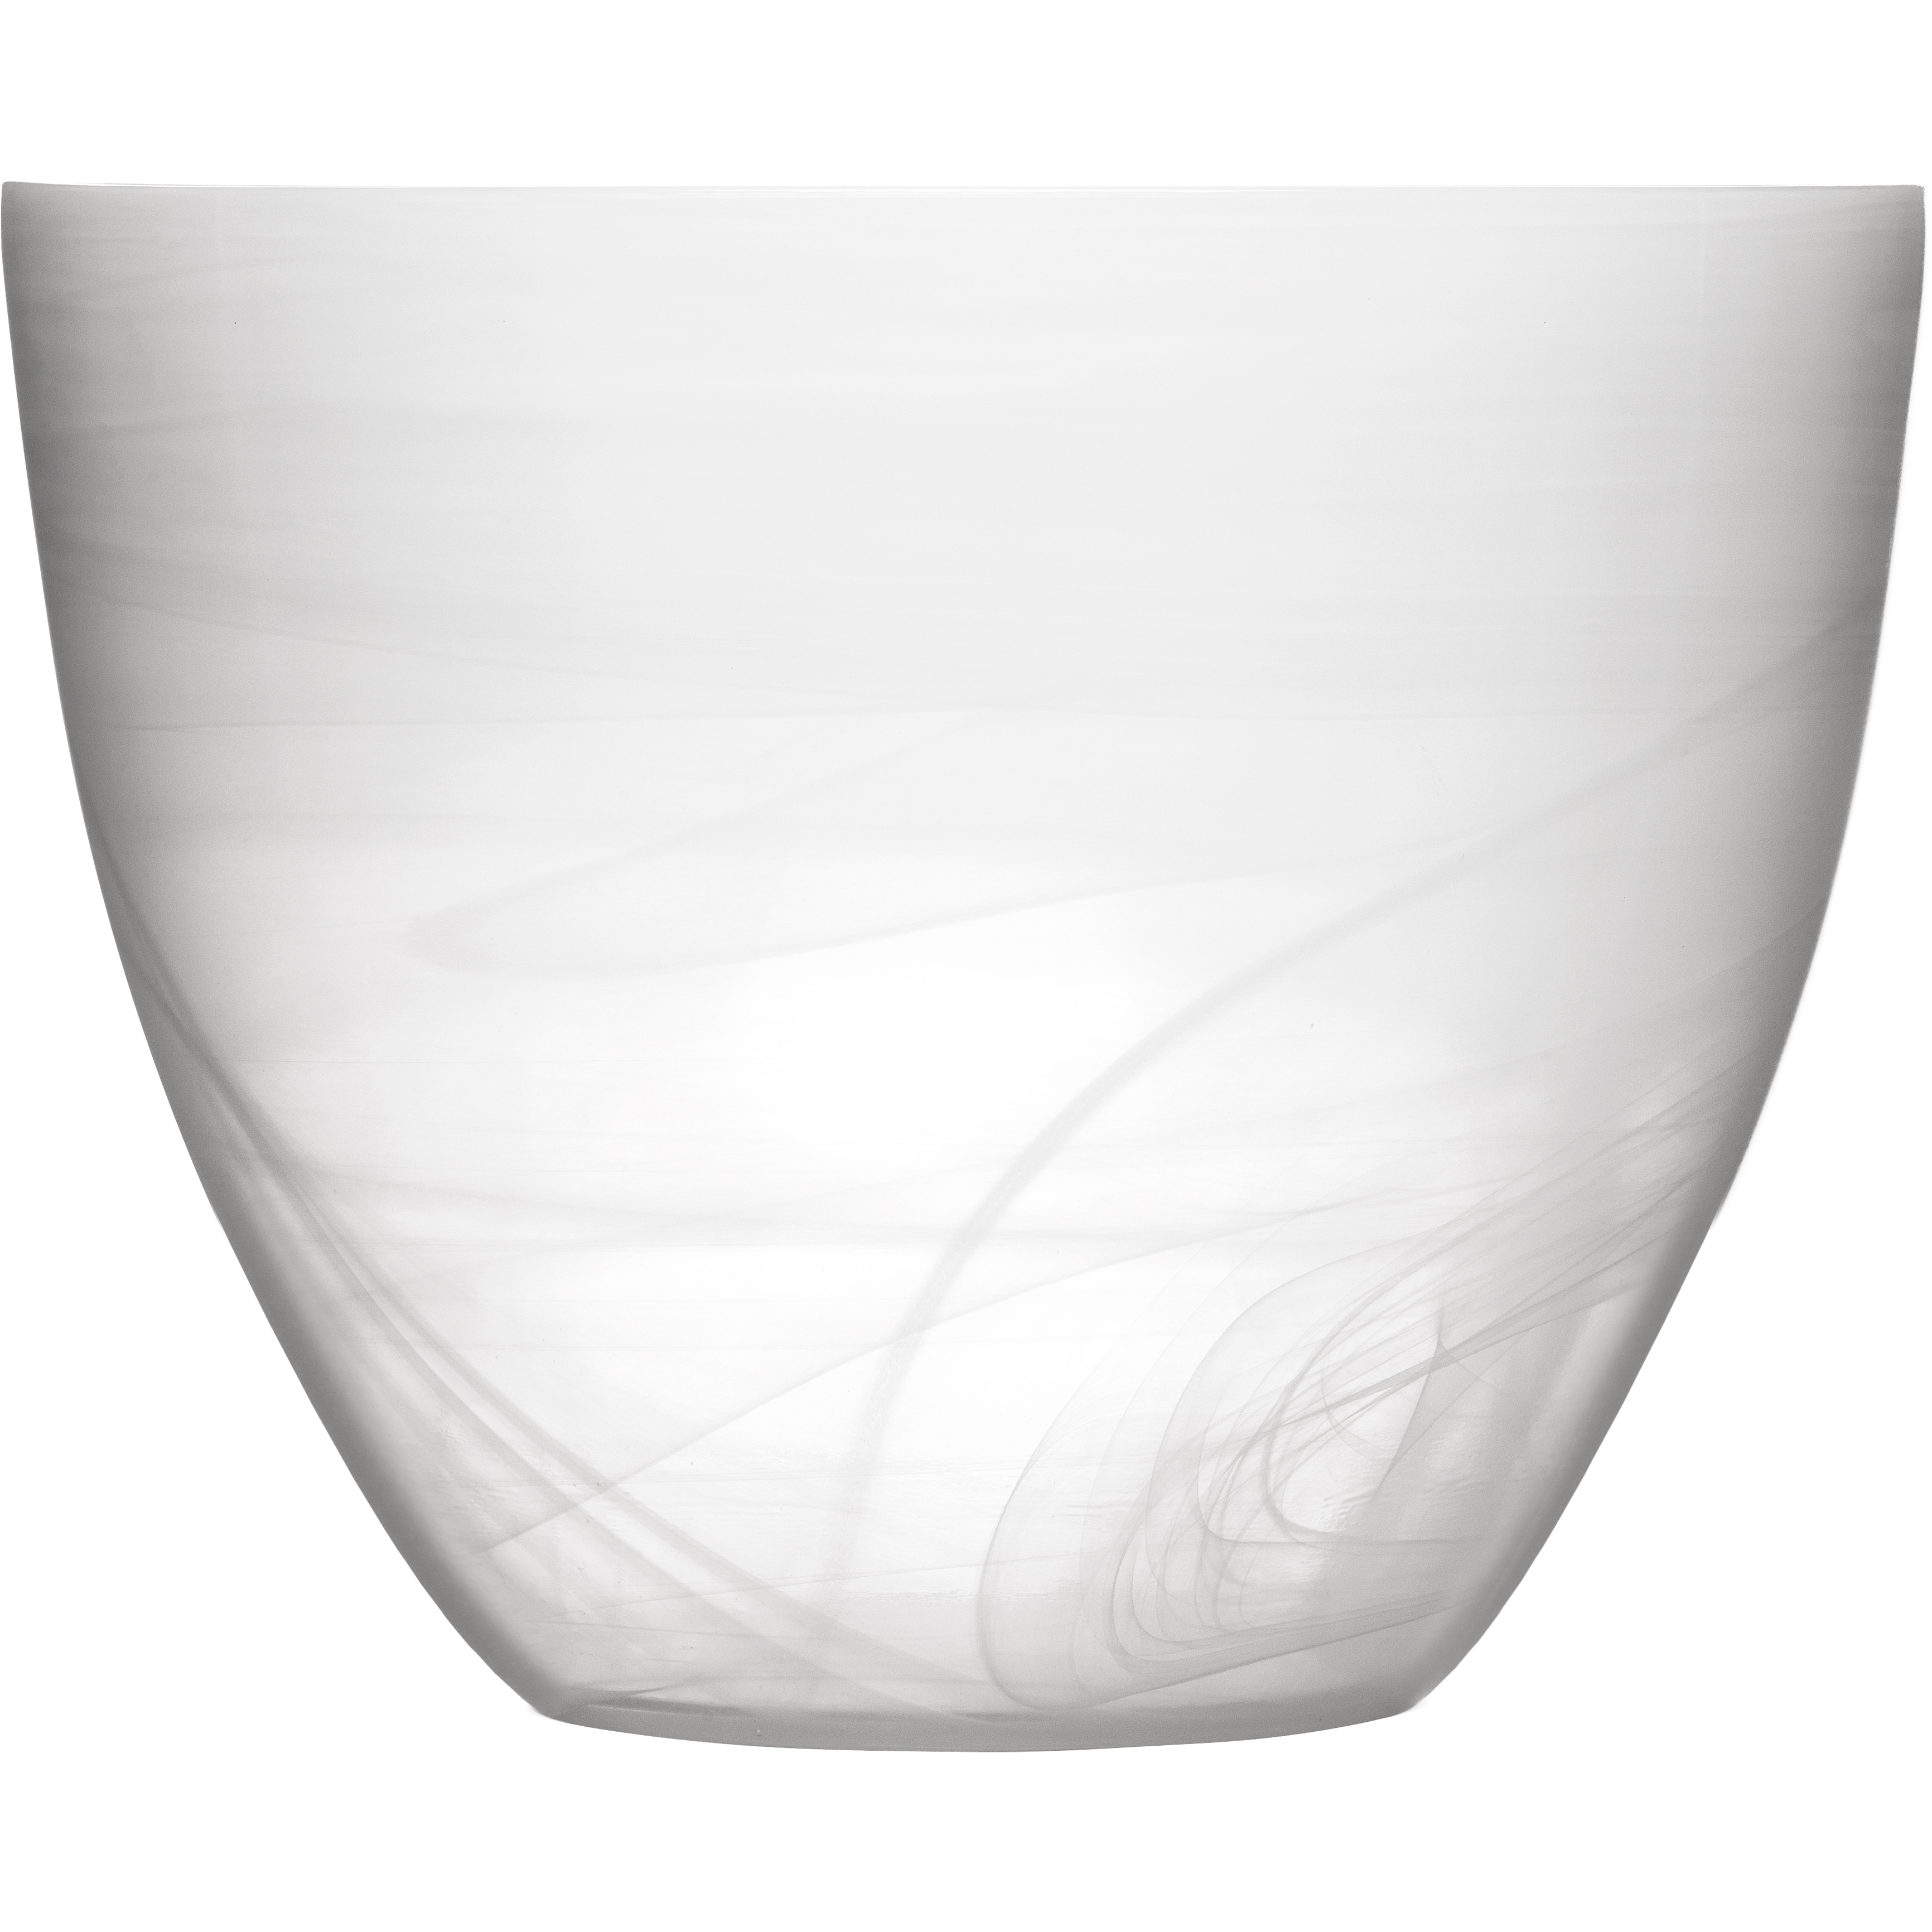 SEAglasbruk Black and White Large White Glass Bowl